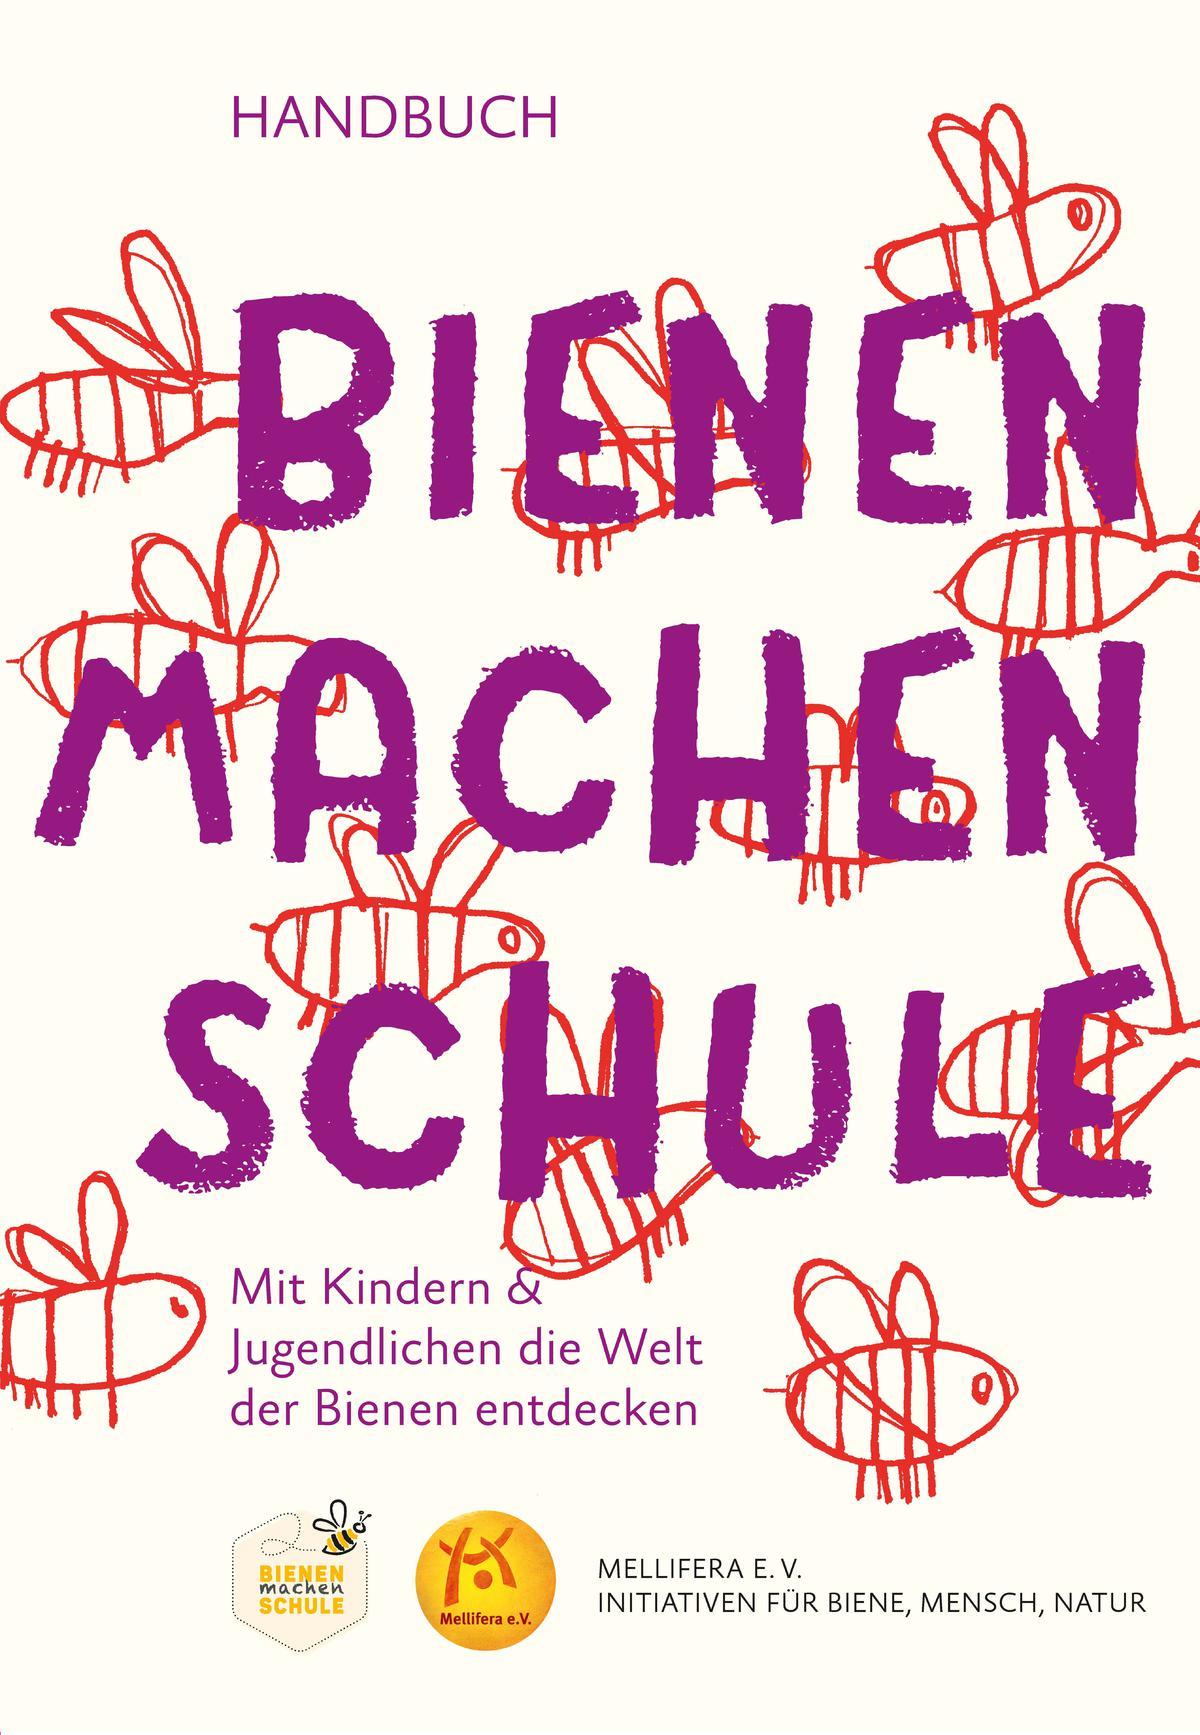 Handbuch \